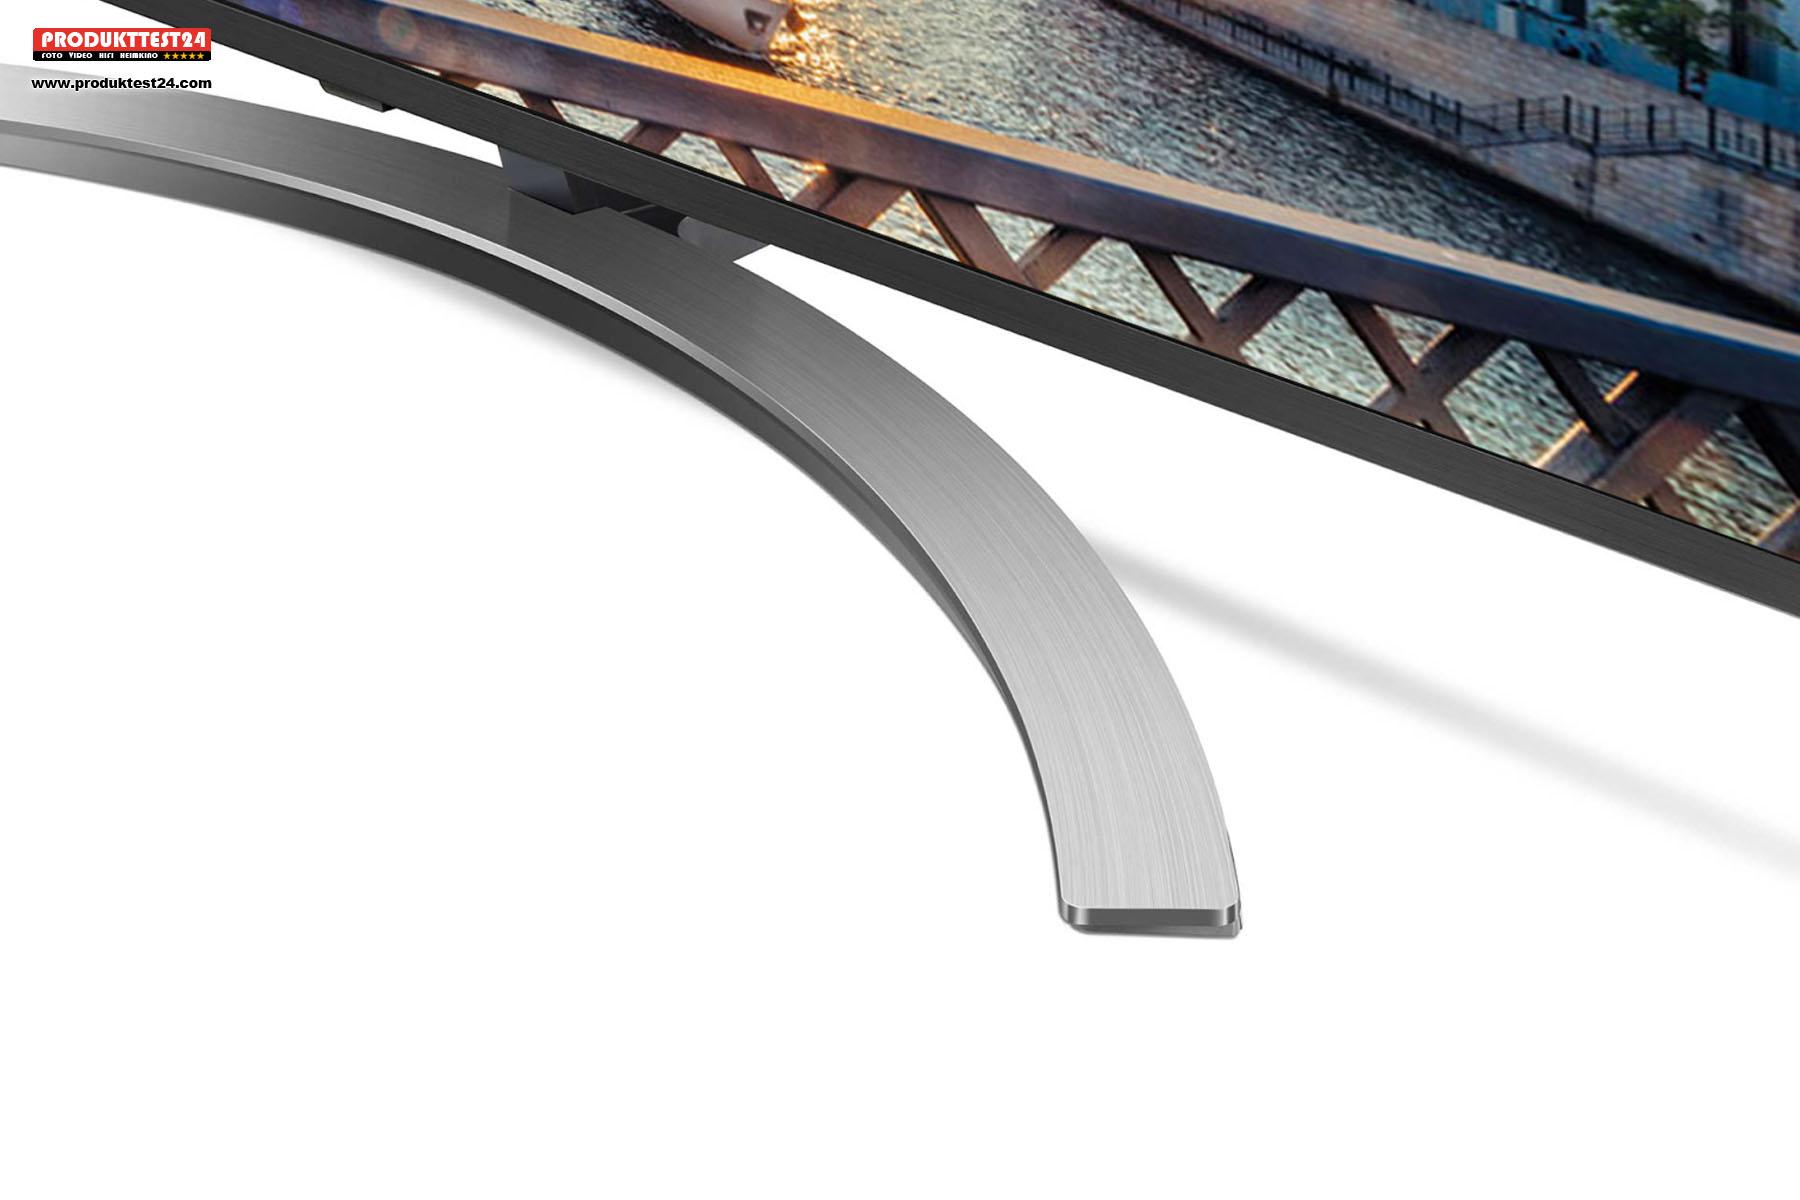 Gebogener Standfuß im gebürstetem Aluminiumlook